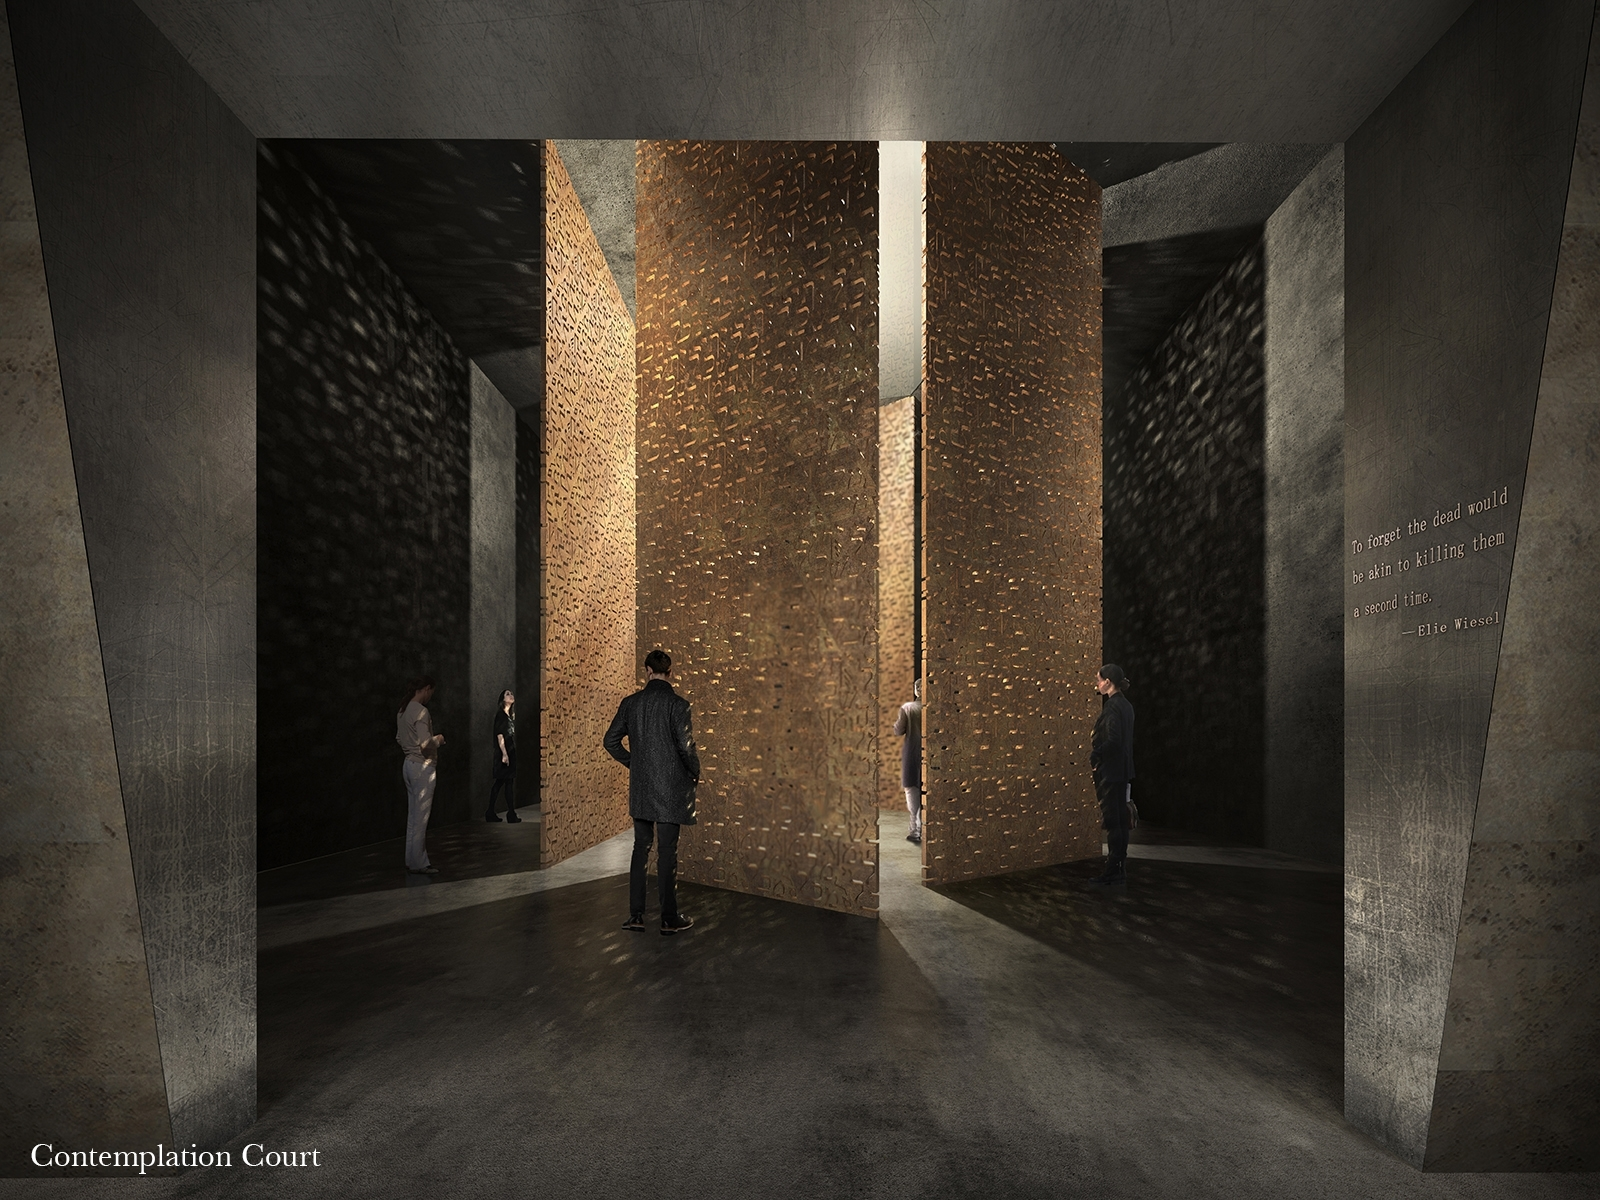 London's Holocaust memorial